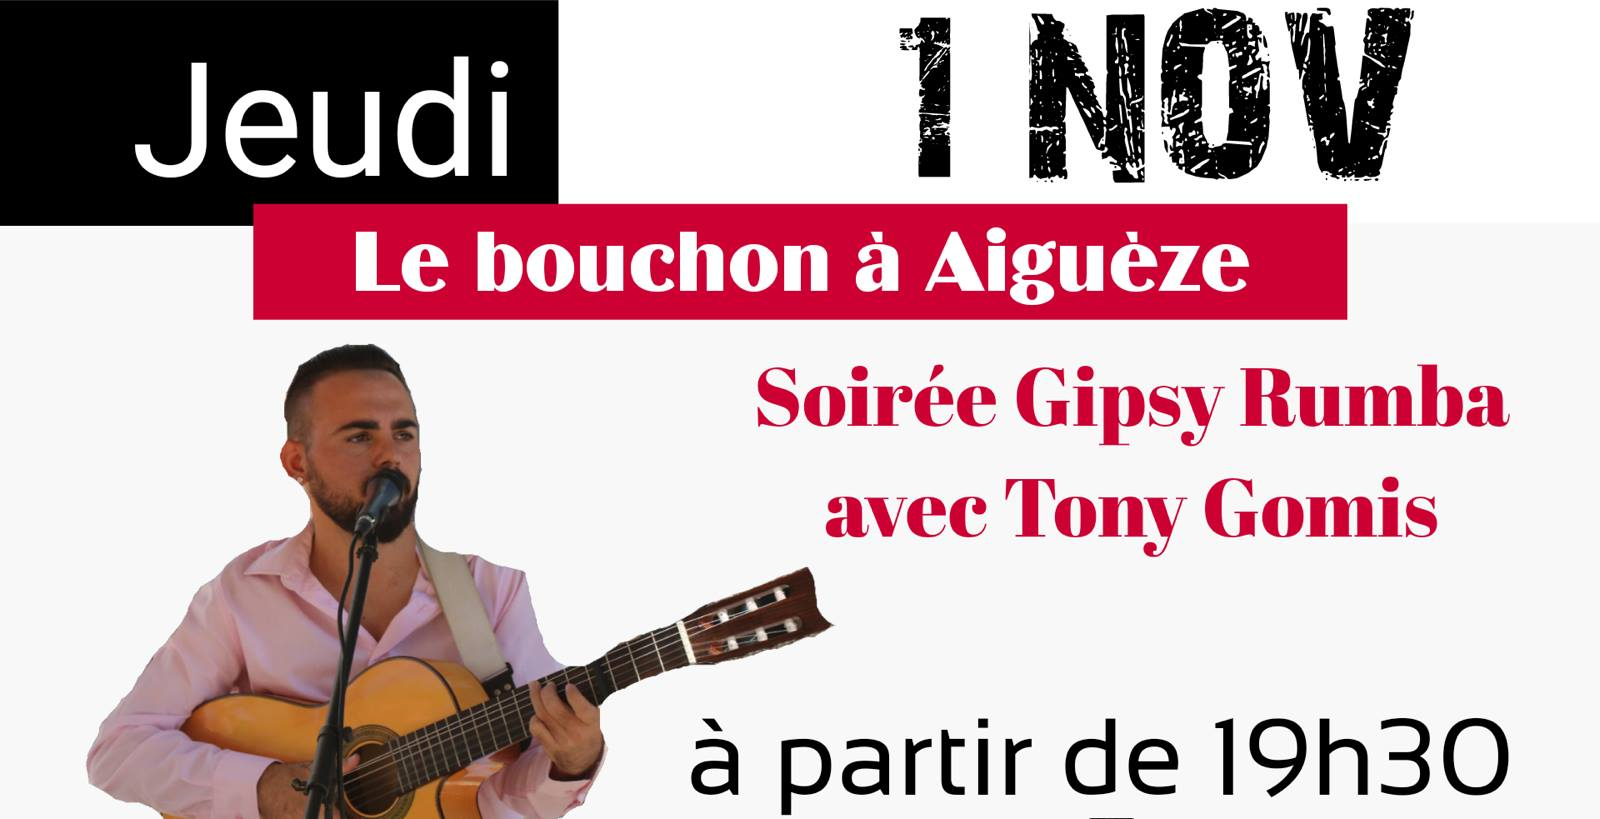 Soirée gypsy rumba avec Tony Gomis restaurant Le Bouchon